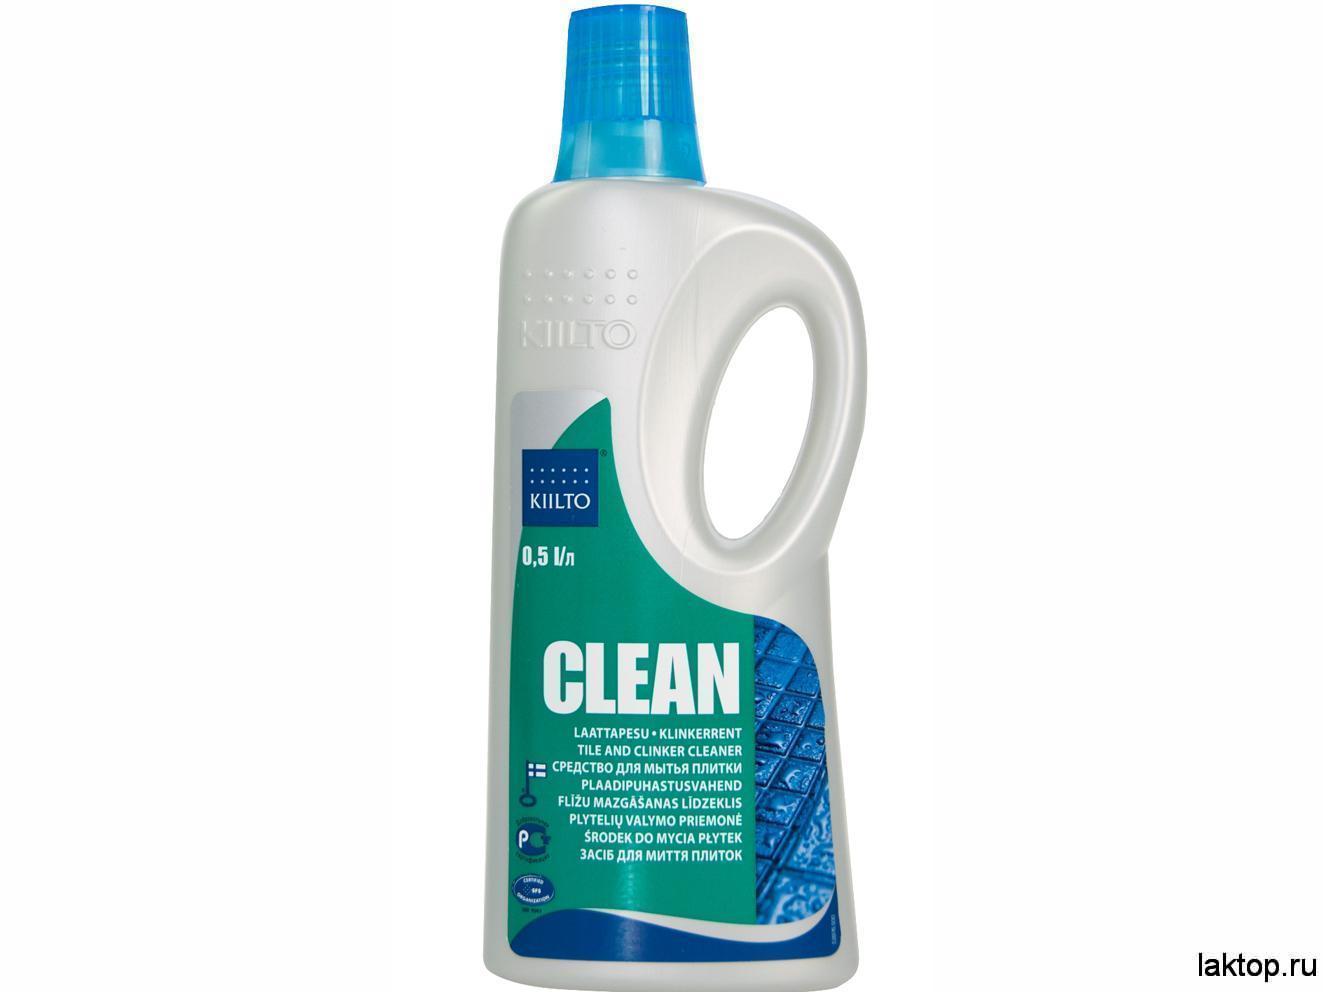 KIILTO Clean для мытья плиток. 510 рублей. Доставка!